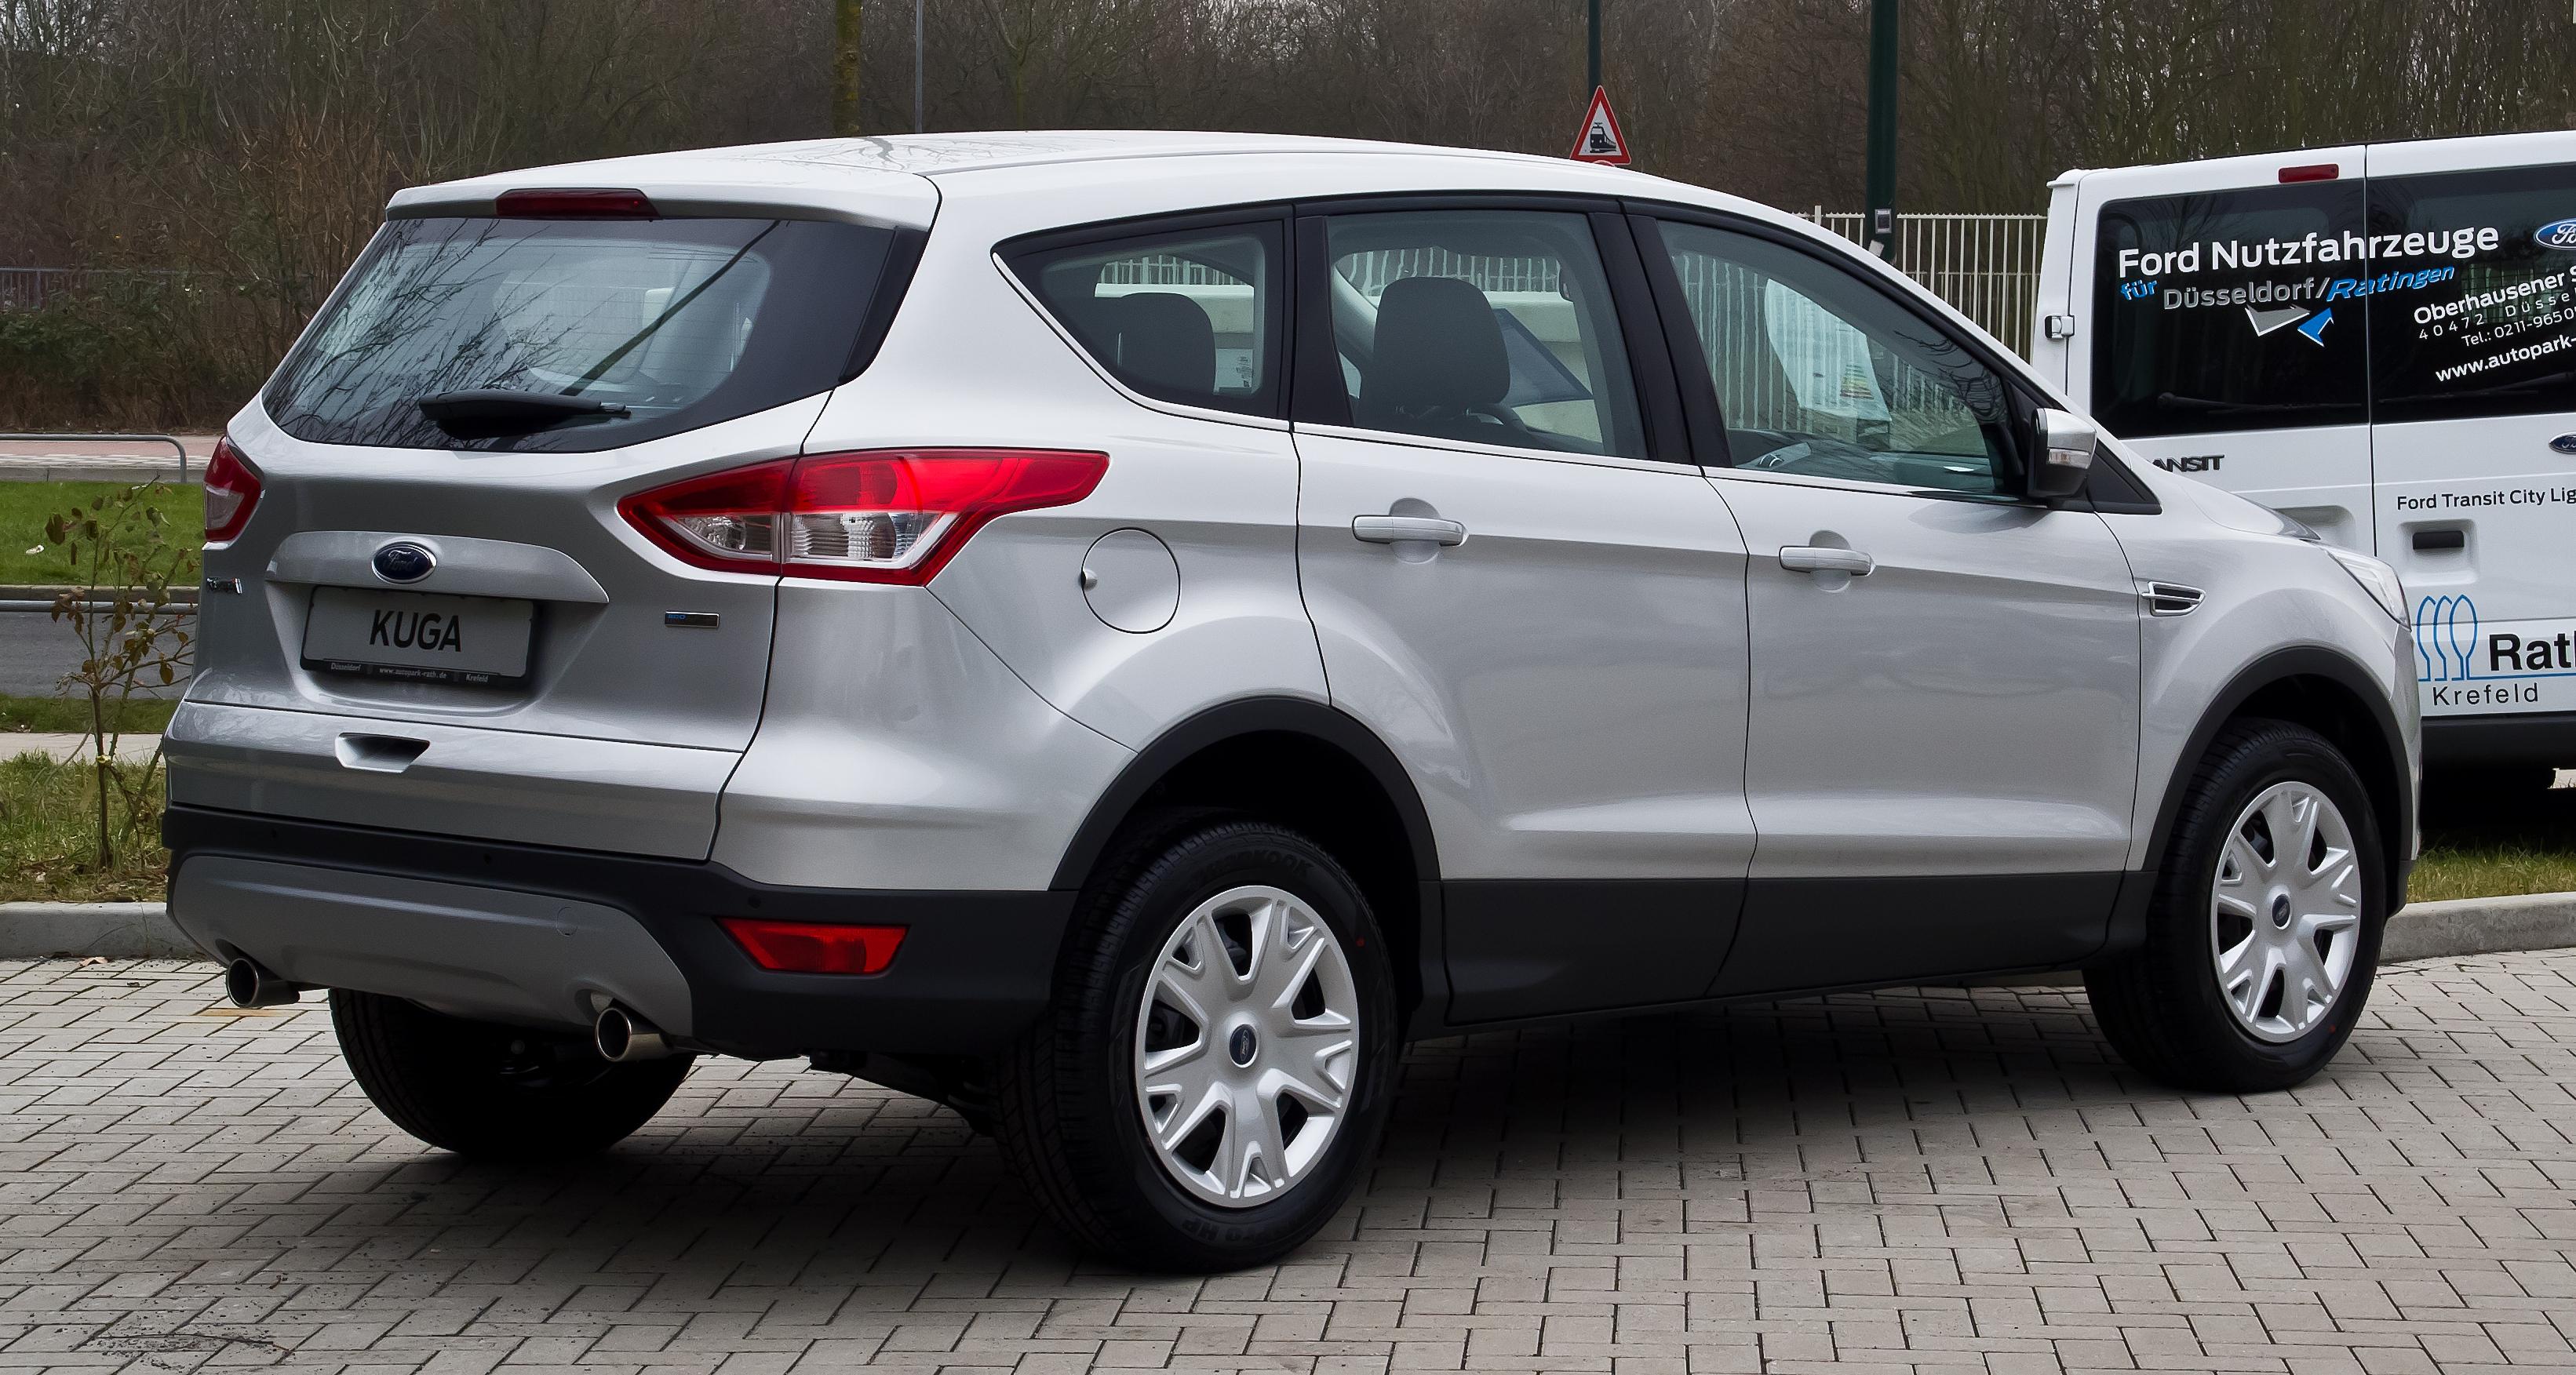 Ford kuga wiki